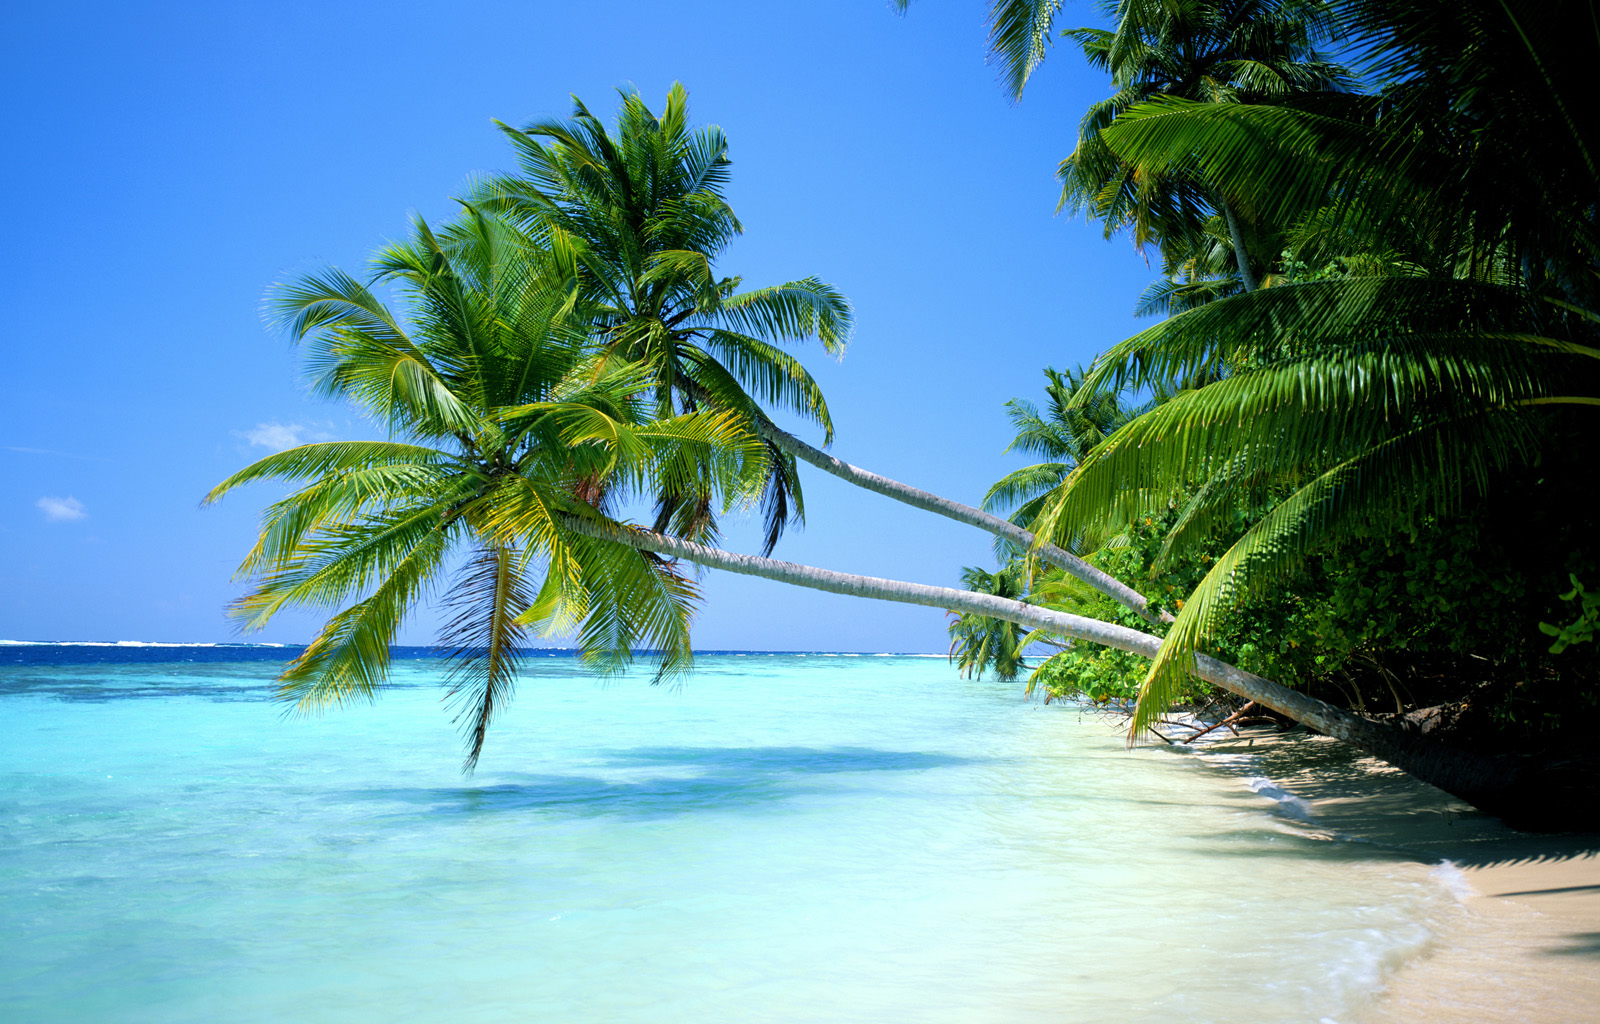 ... fondo hd palmeras playa wallpaper wallpaper fondo hd fondo de pantalla